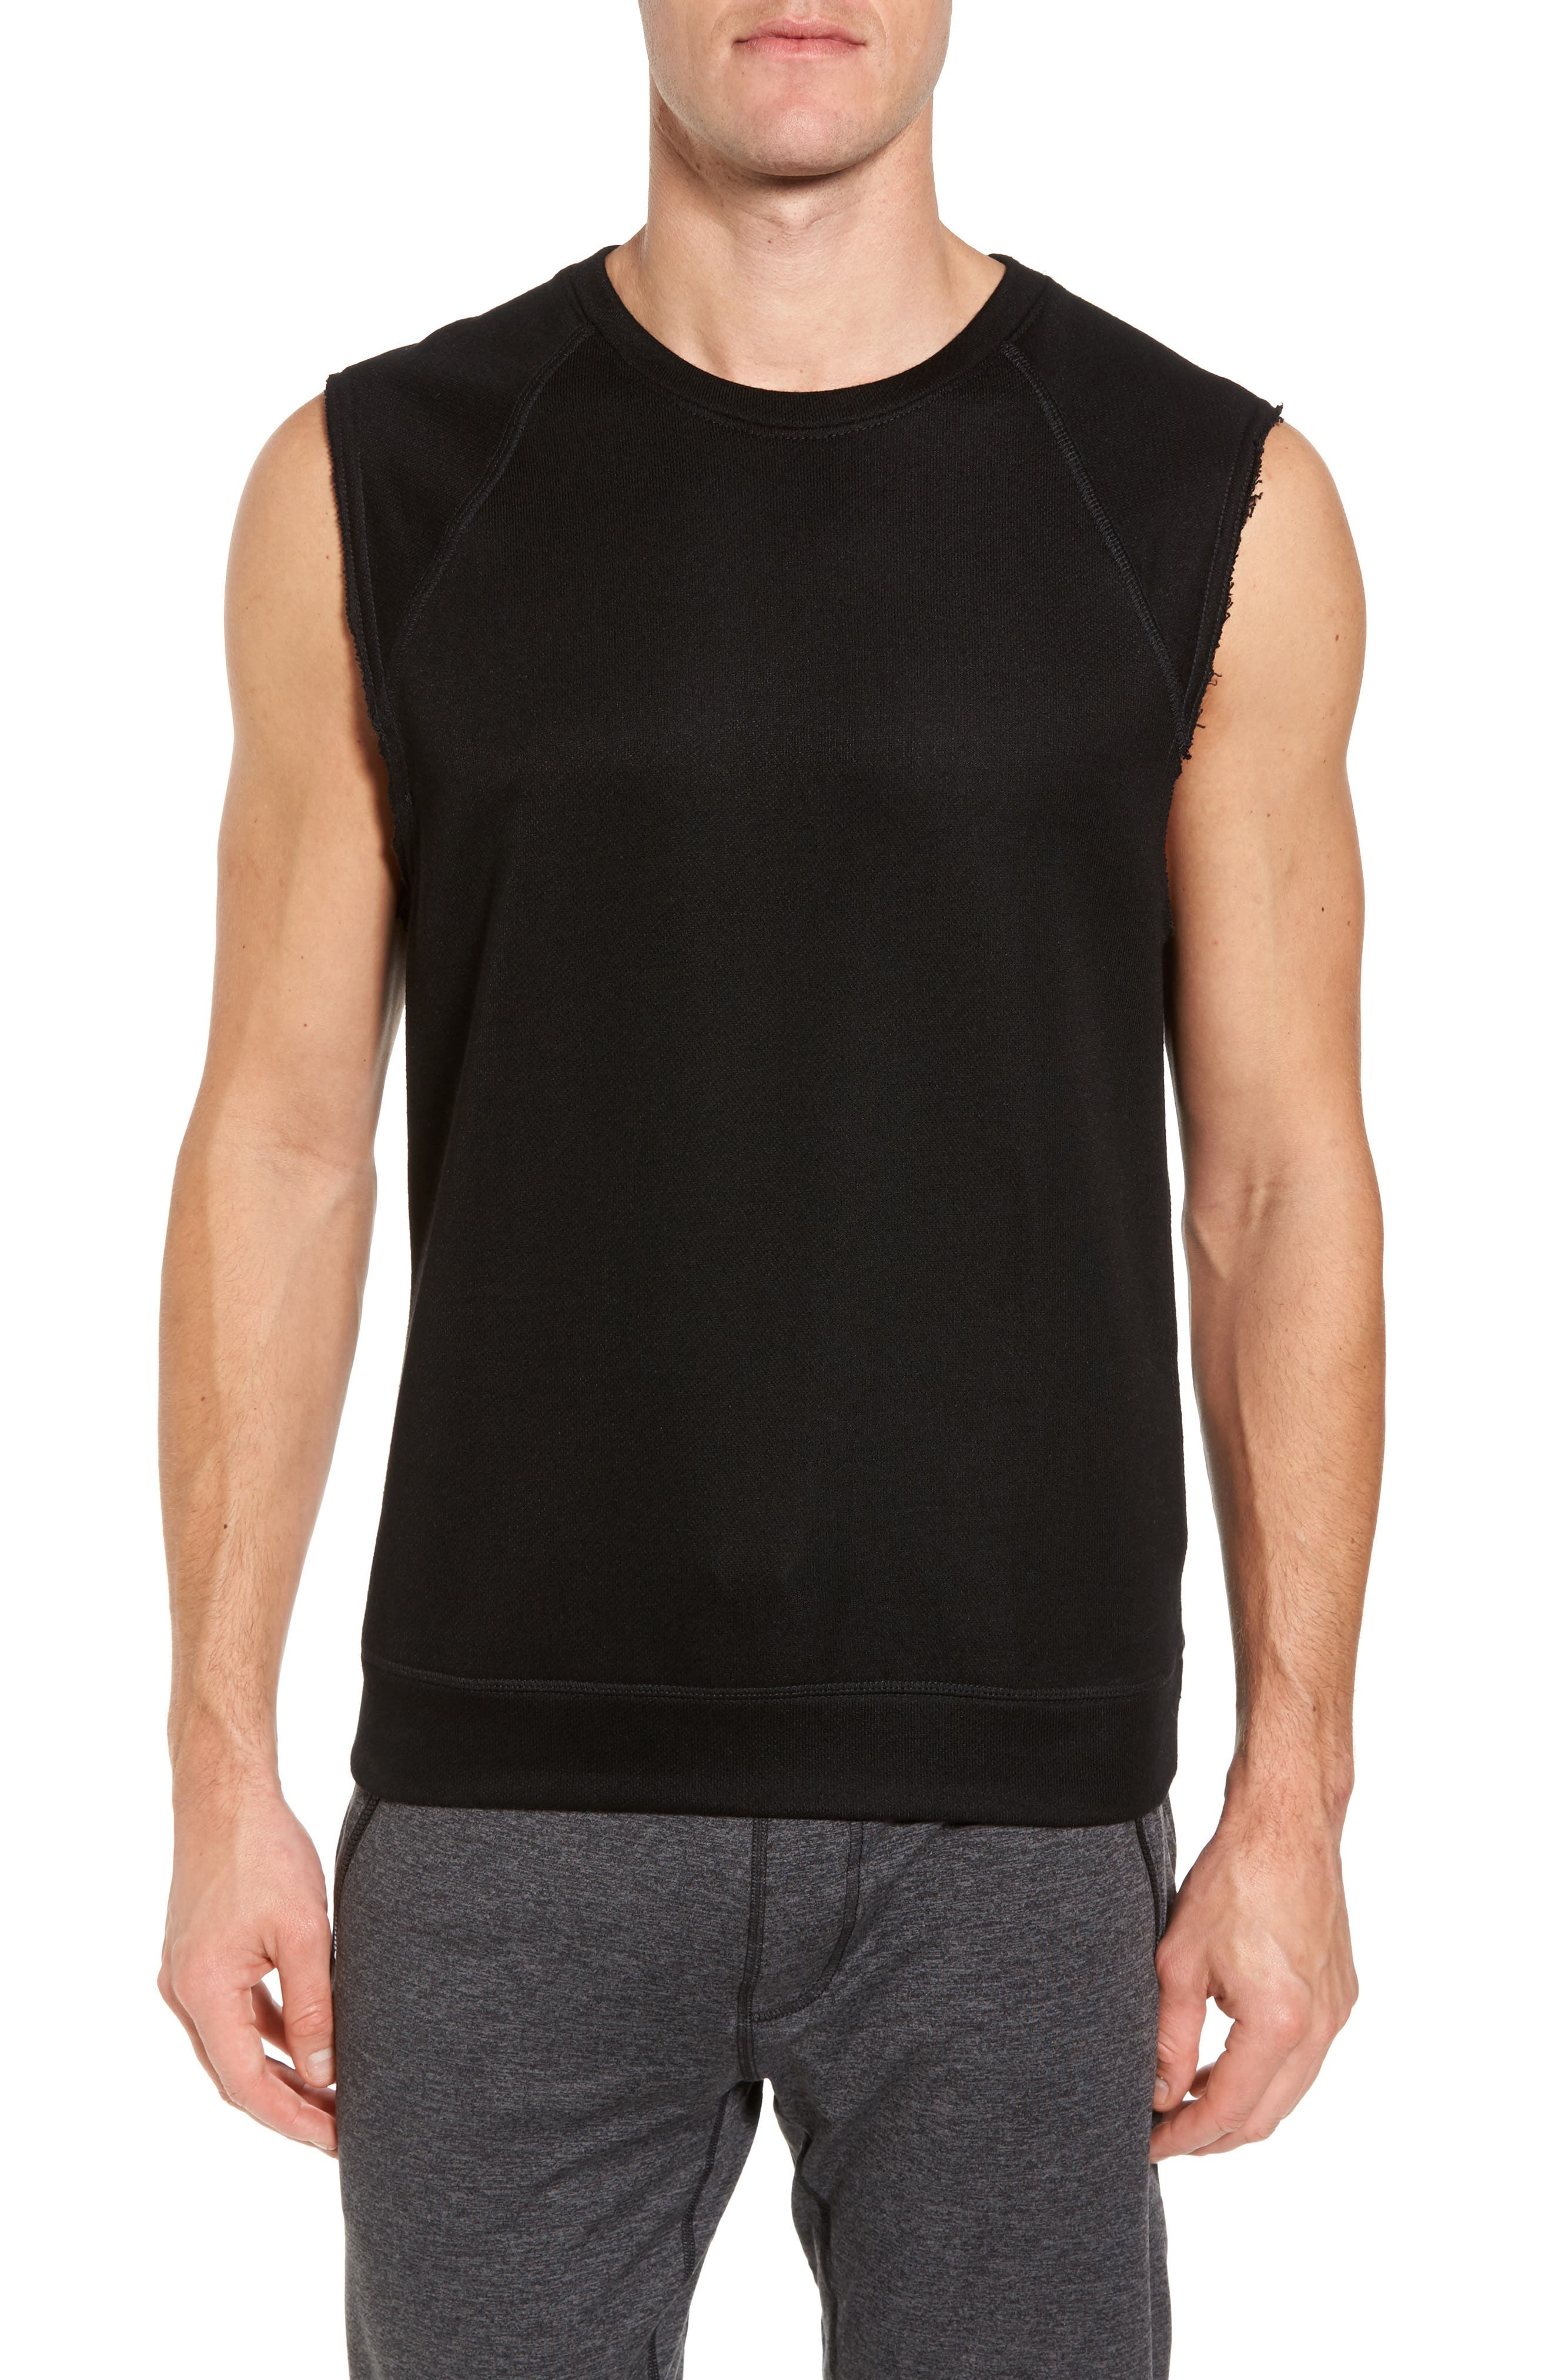 ALO Dosha Relaxed Fit Sweatshirt Tank, Main, color, BLACK